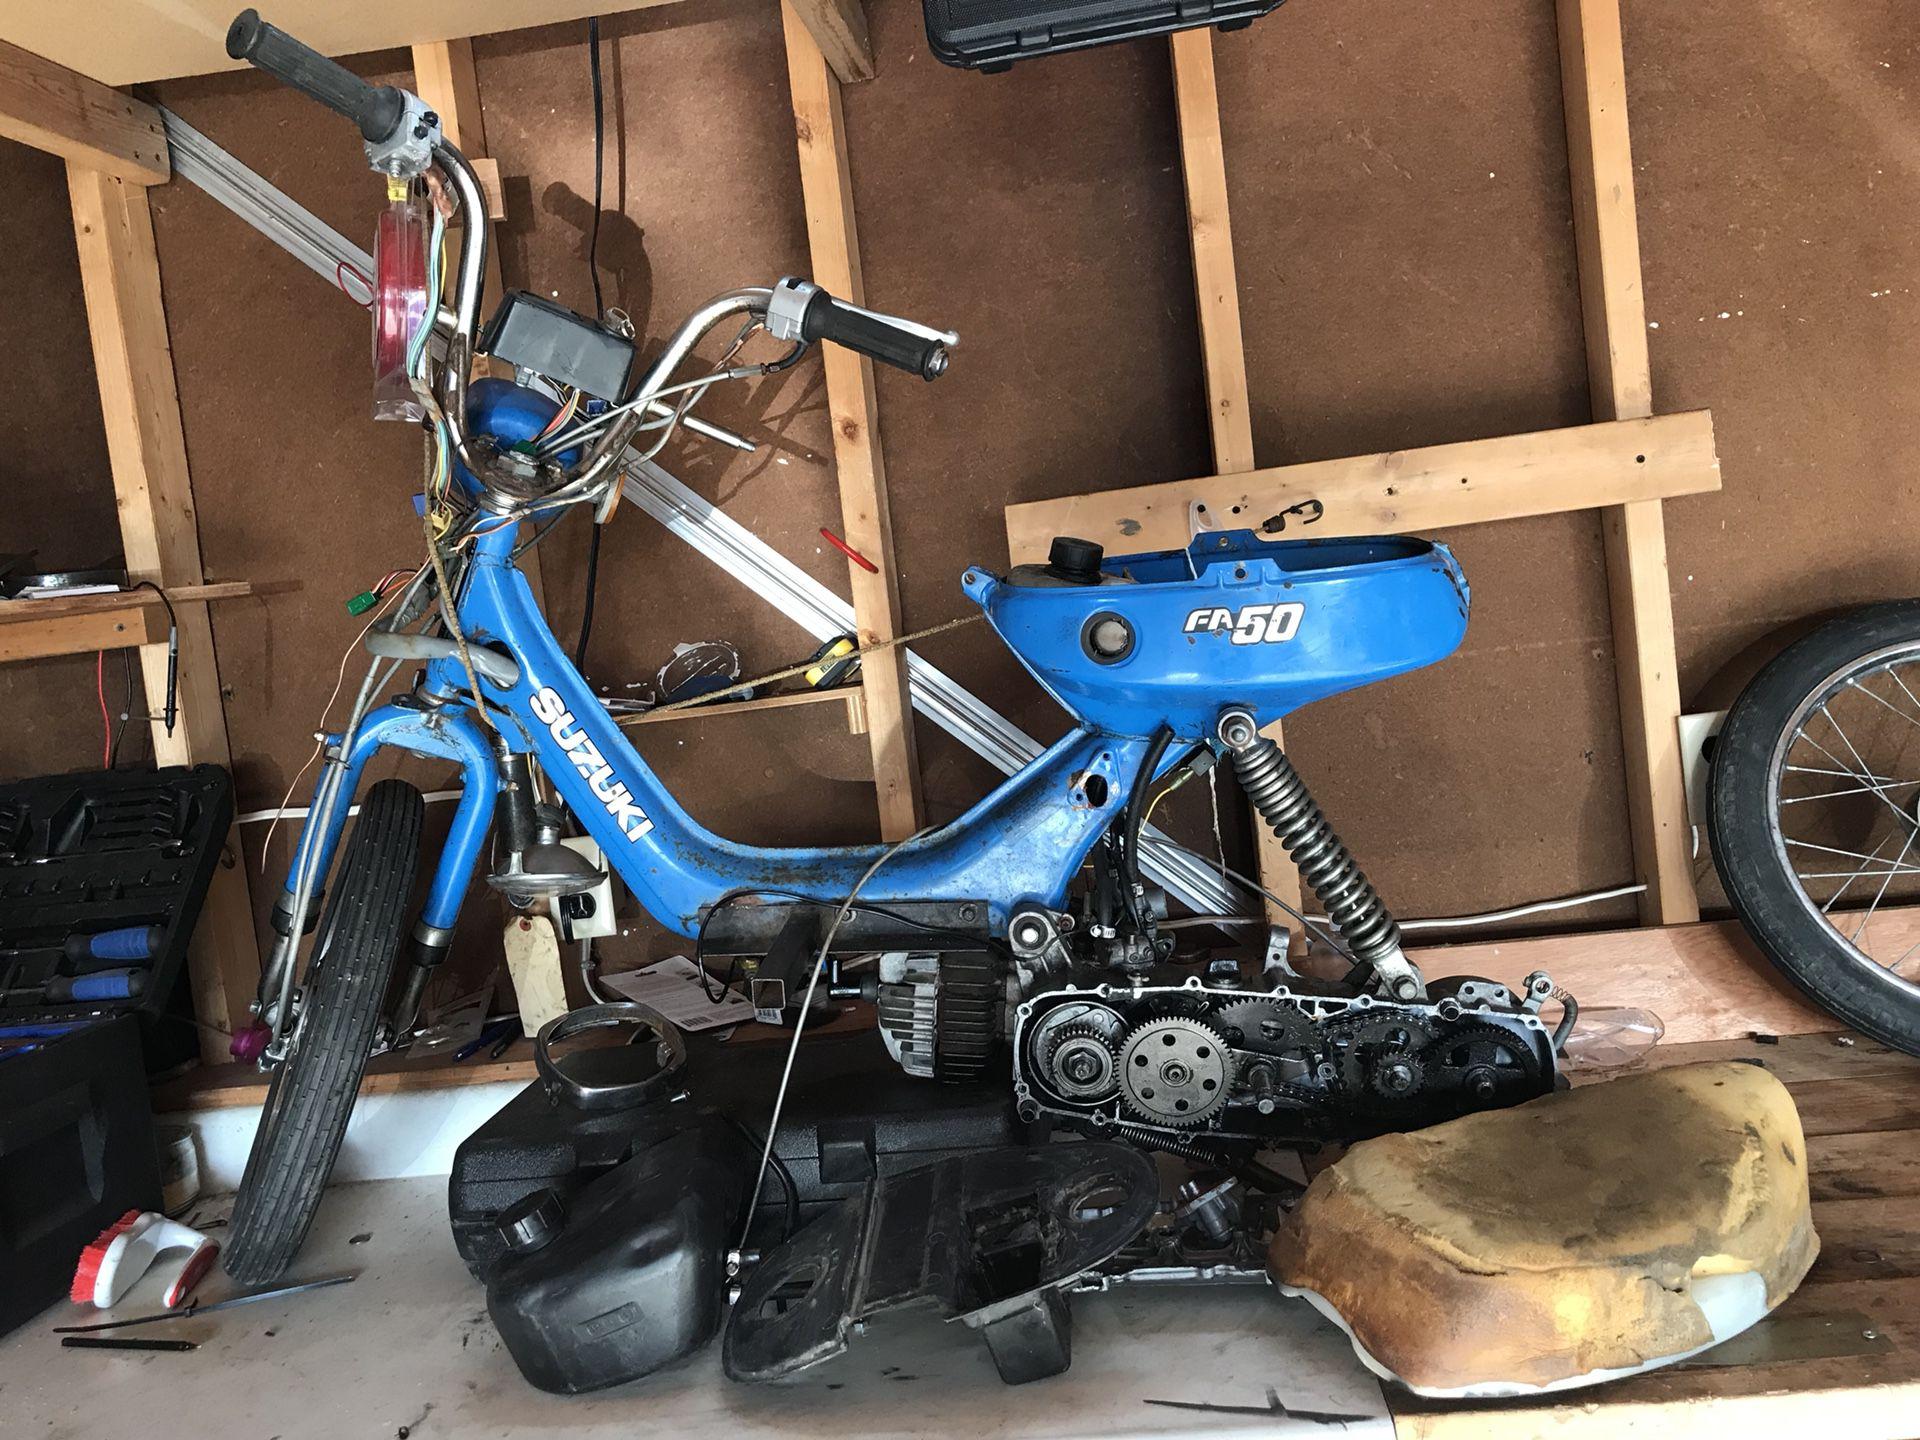 Photo 1982 Suzuki fa50 moped project